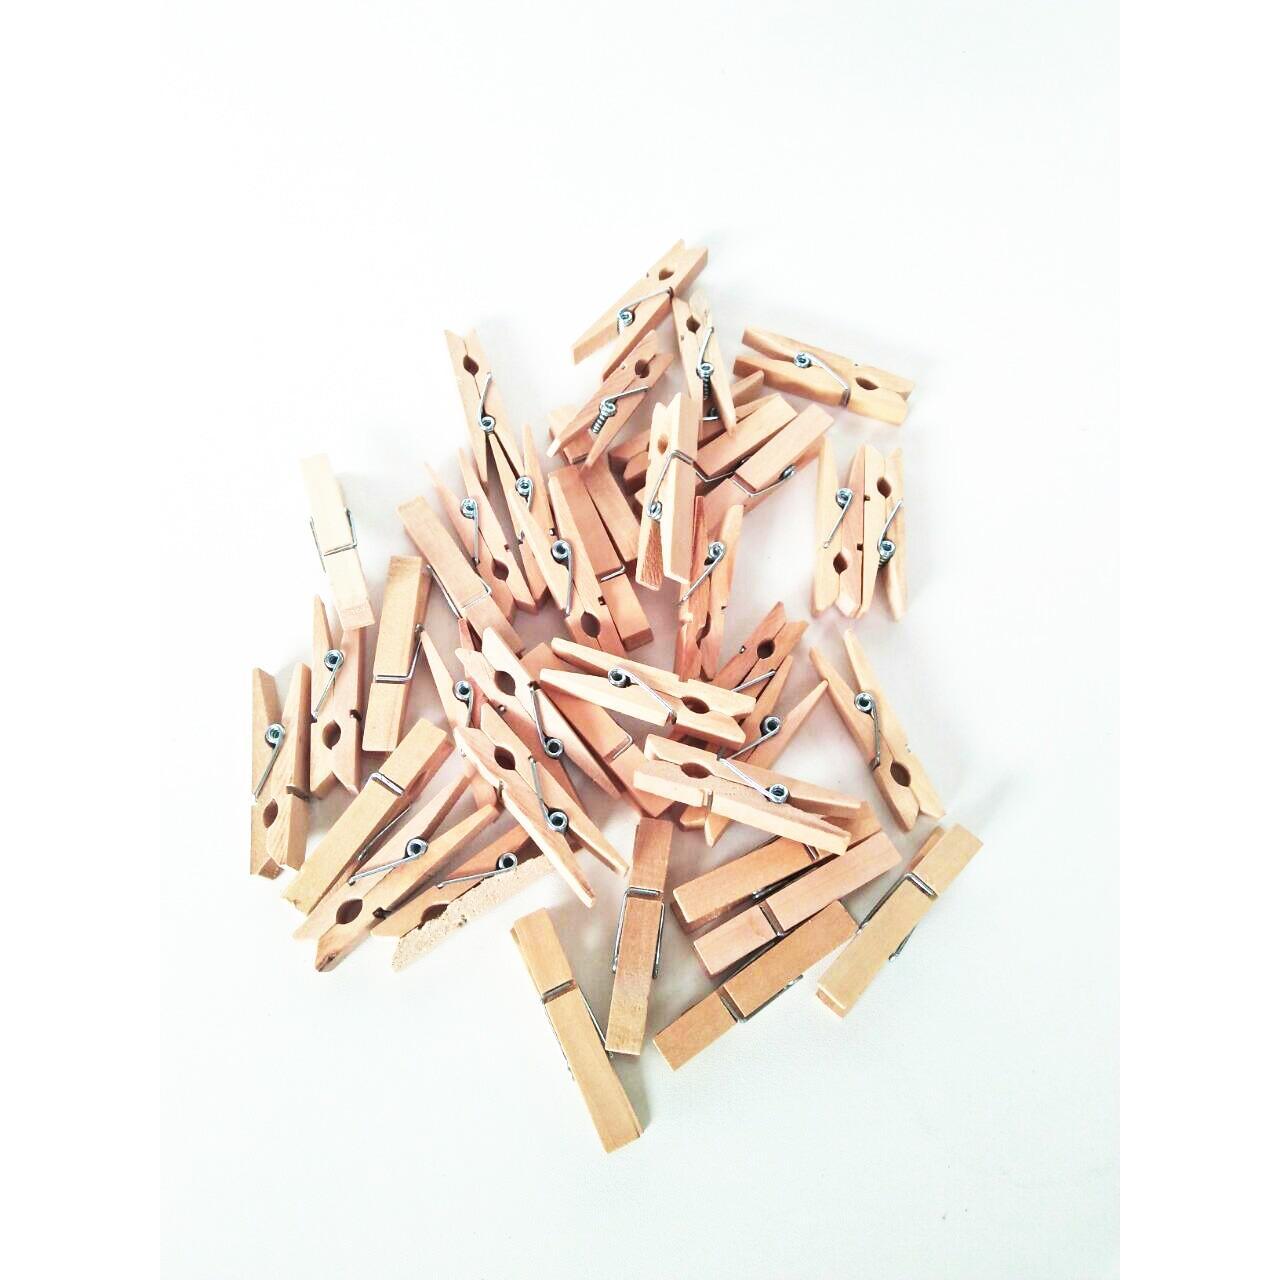 Warna natural kayu Wooden Clip wood clothes pin Craft isi 40 pcs ukuran 4.5 cm - Penjepit kayu jepit foto